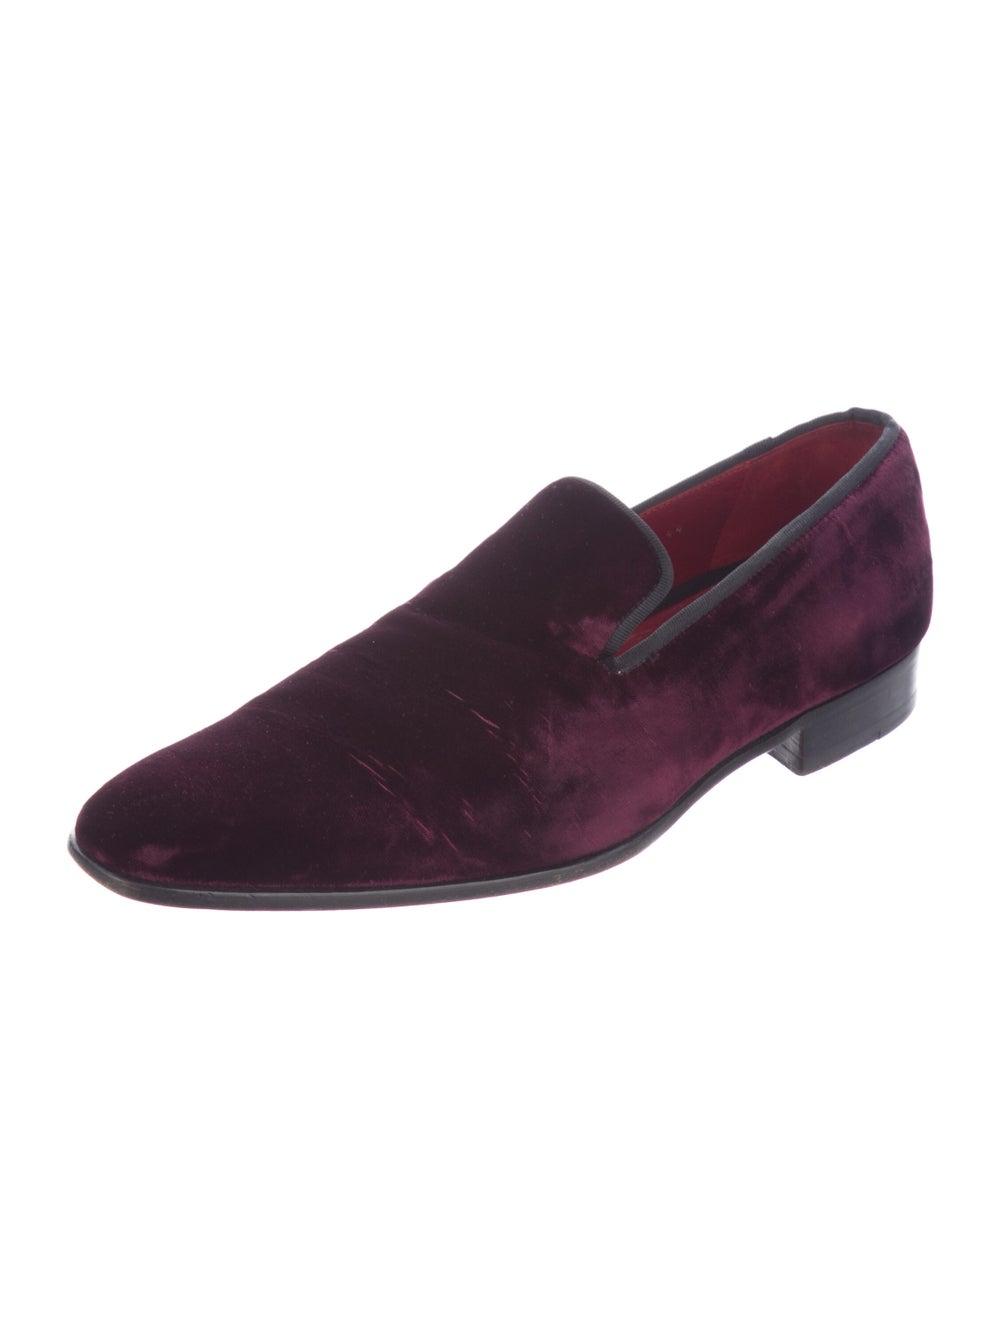 Magnanni Slippers Purple - image 2